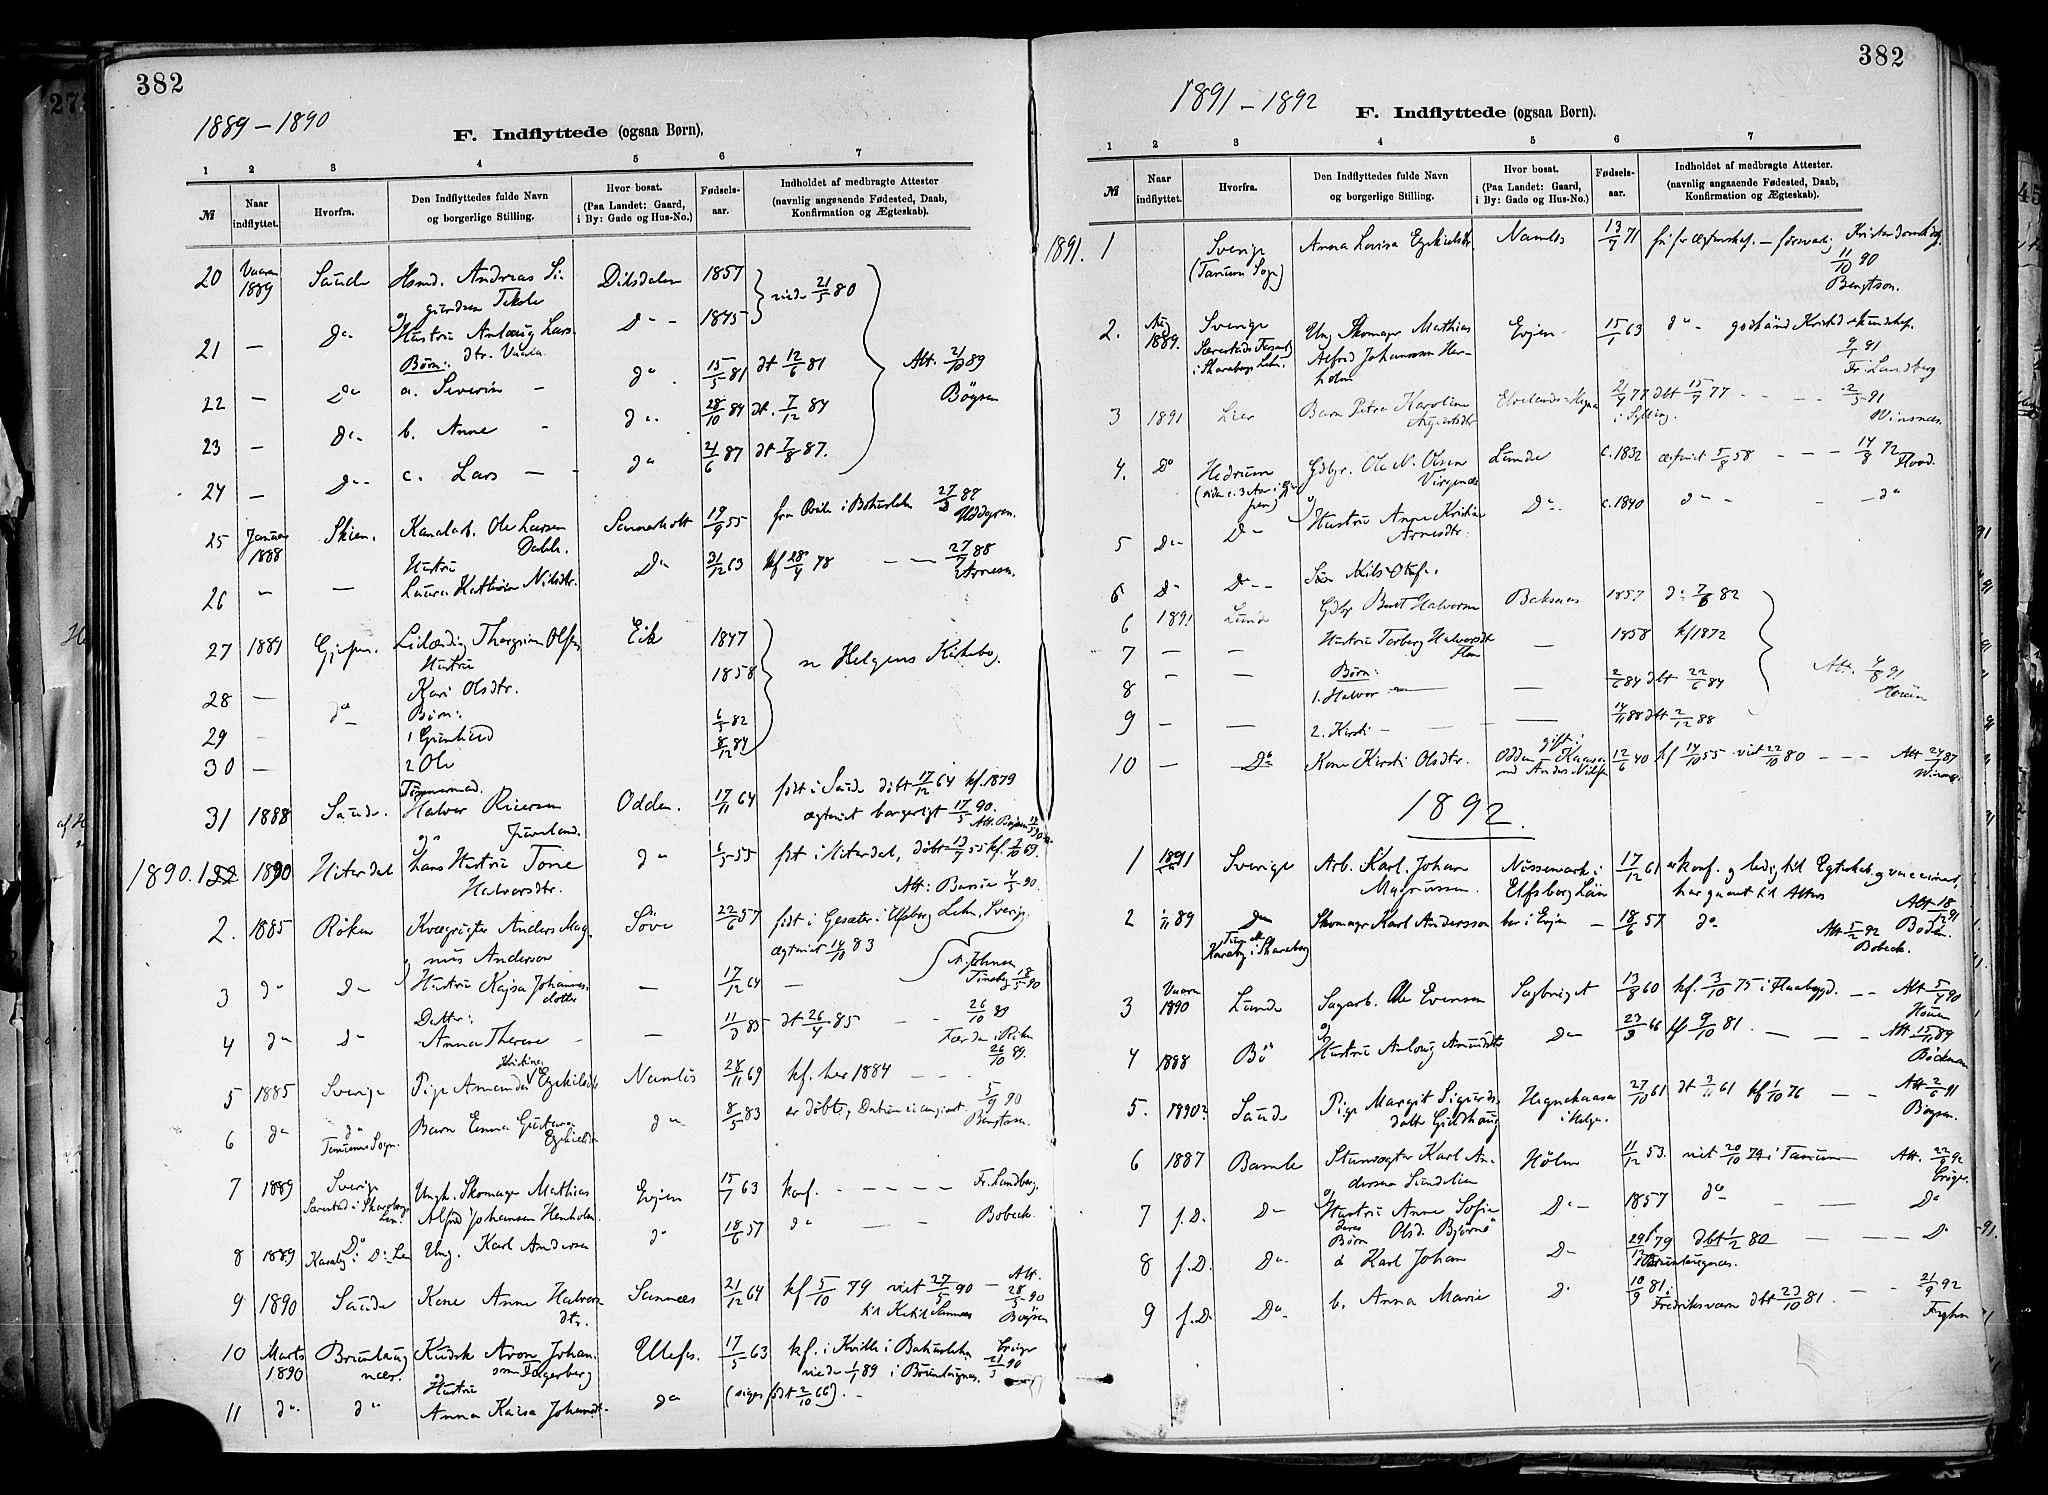 SAKO, Holla kirkebøker, F/Fa/L0008: Ministerialbok nr. 8, 1882-1897, s. 382